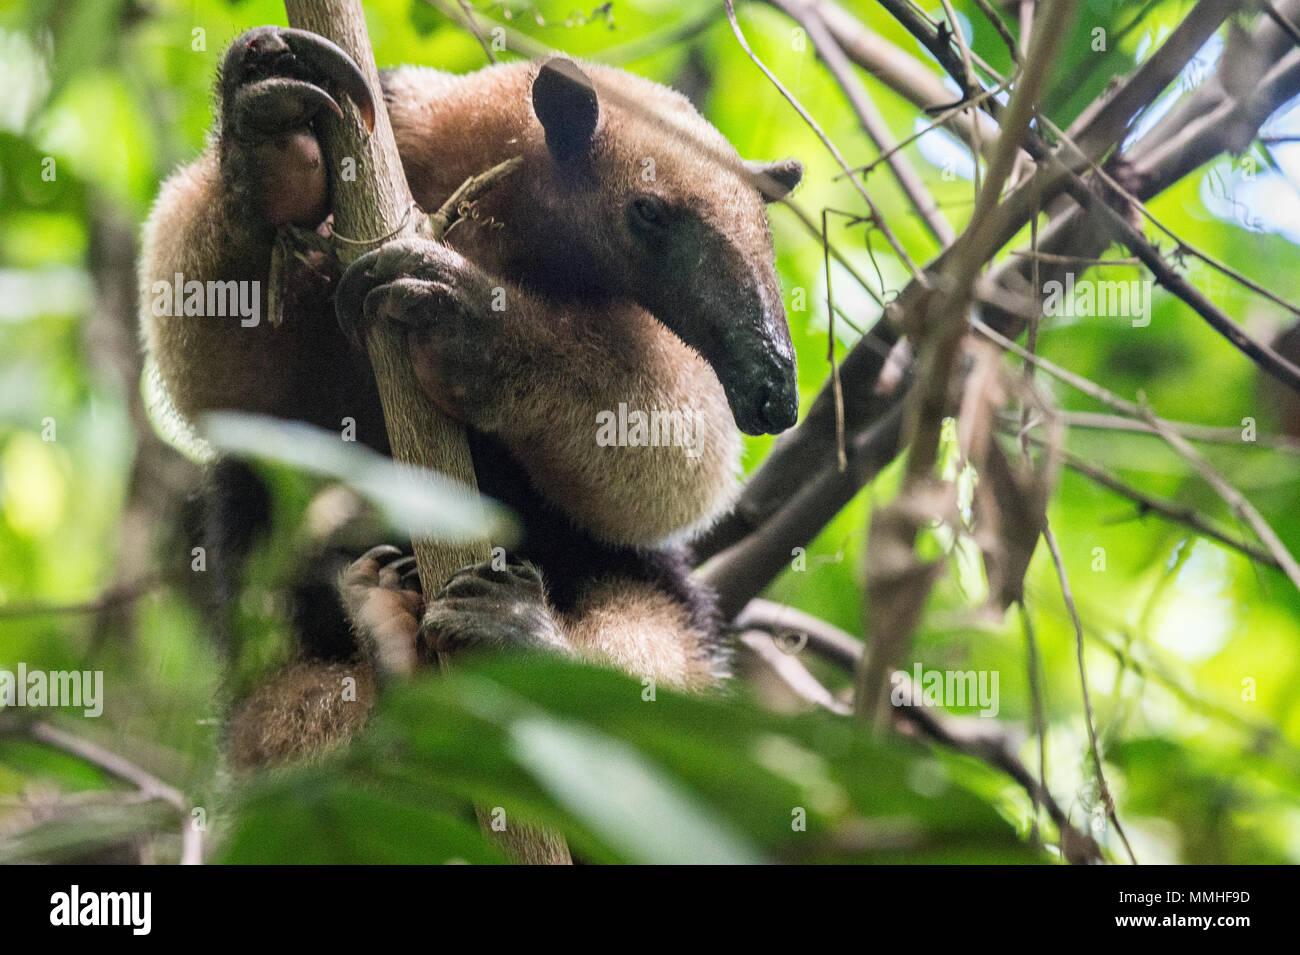 Northern Tamandua, Tamandua mexicana, Myrmecophagidae, Corcovado National Park, Costa Rica, Centroamerica - Stock Image